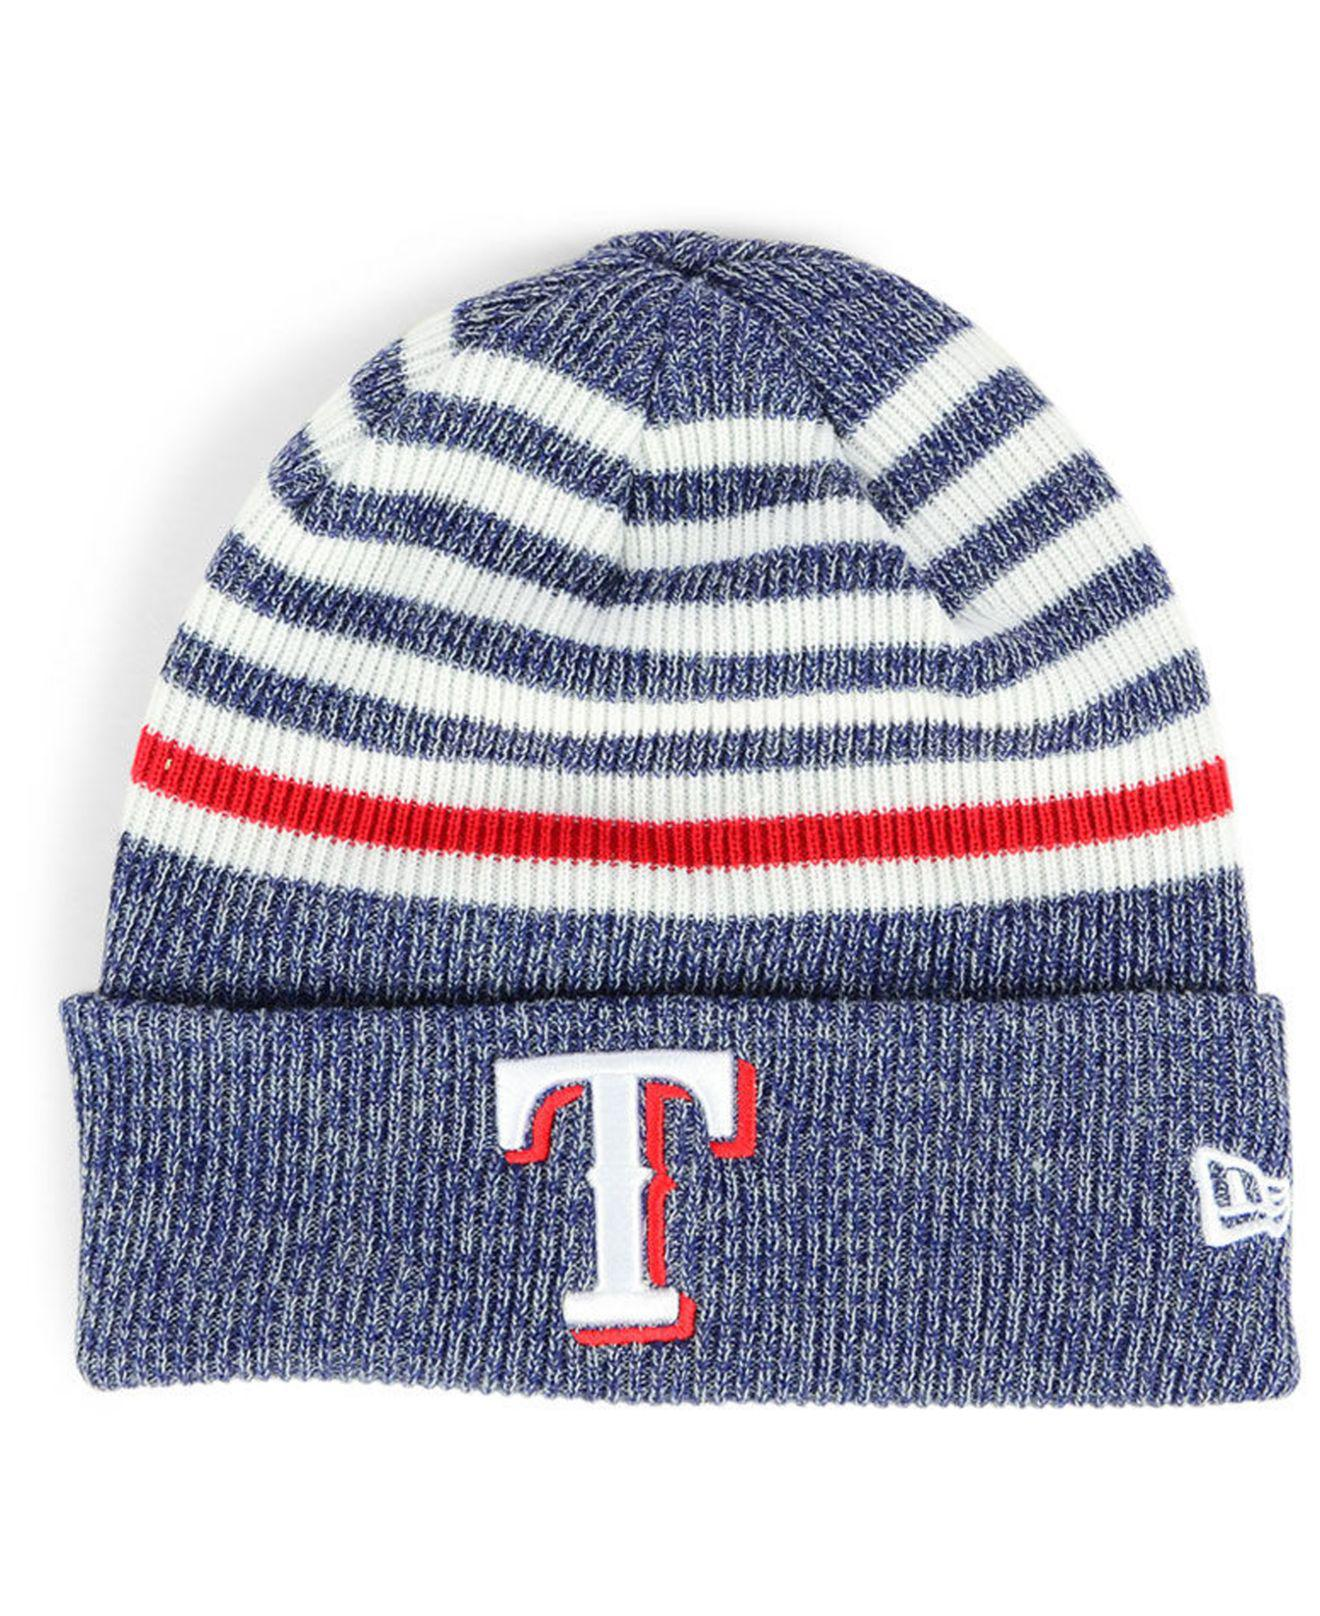 premium selection 594dd ae342 Lyst - KTZ Texas Rangers Striped Cuff Knit Hat in Blue for Men